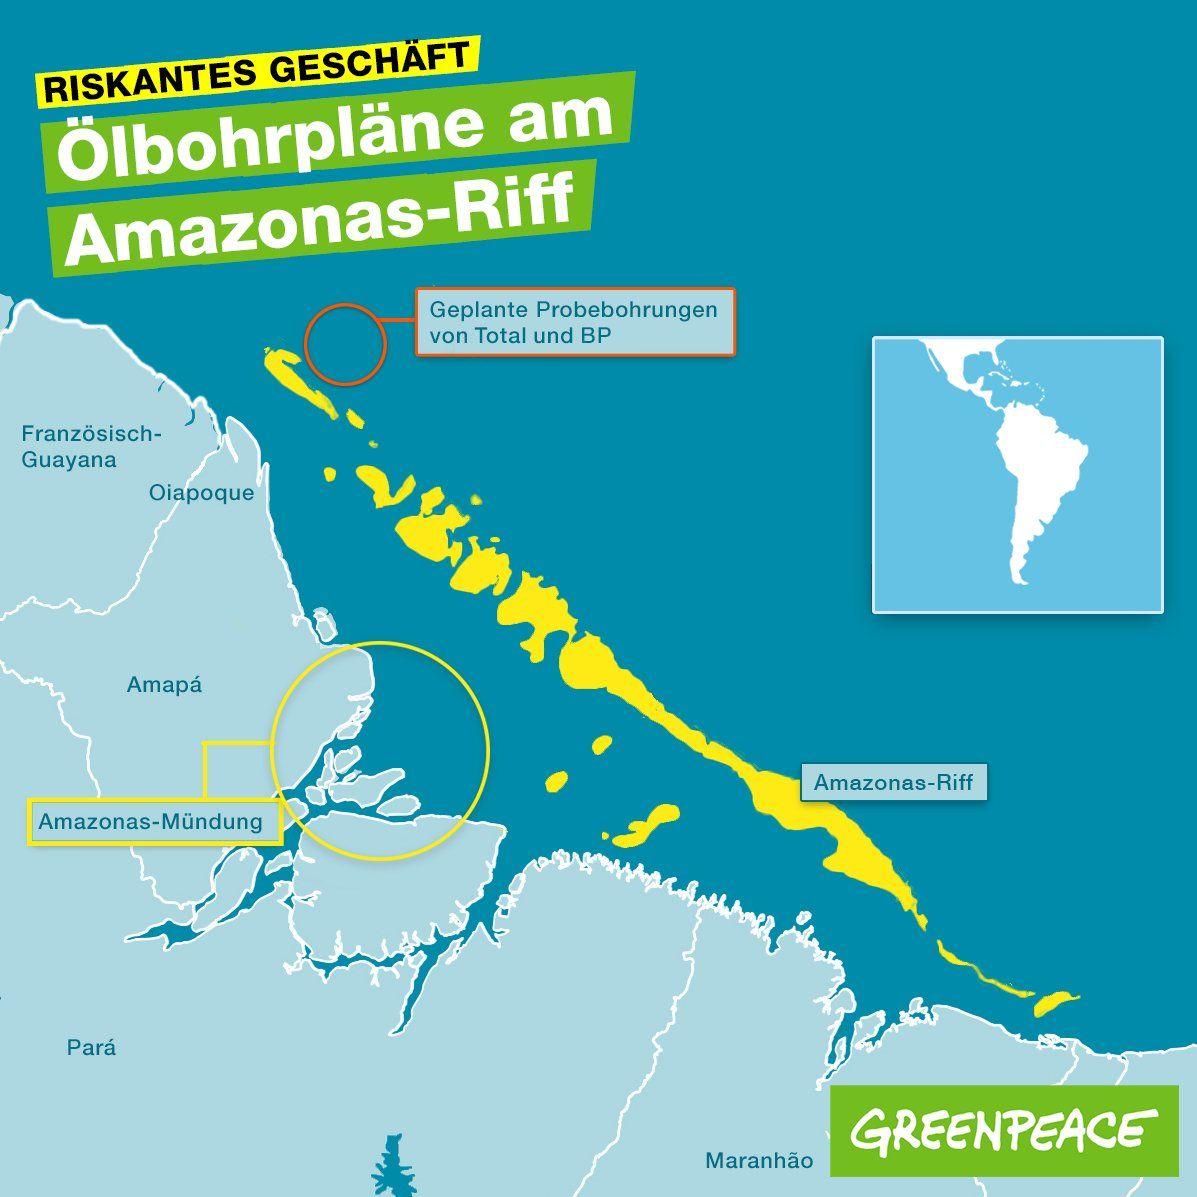 Amazonas Riff Retten Olbohrplane Stoppen Amazonas Planer Planen